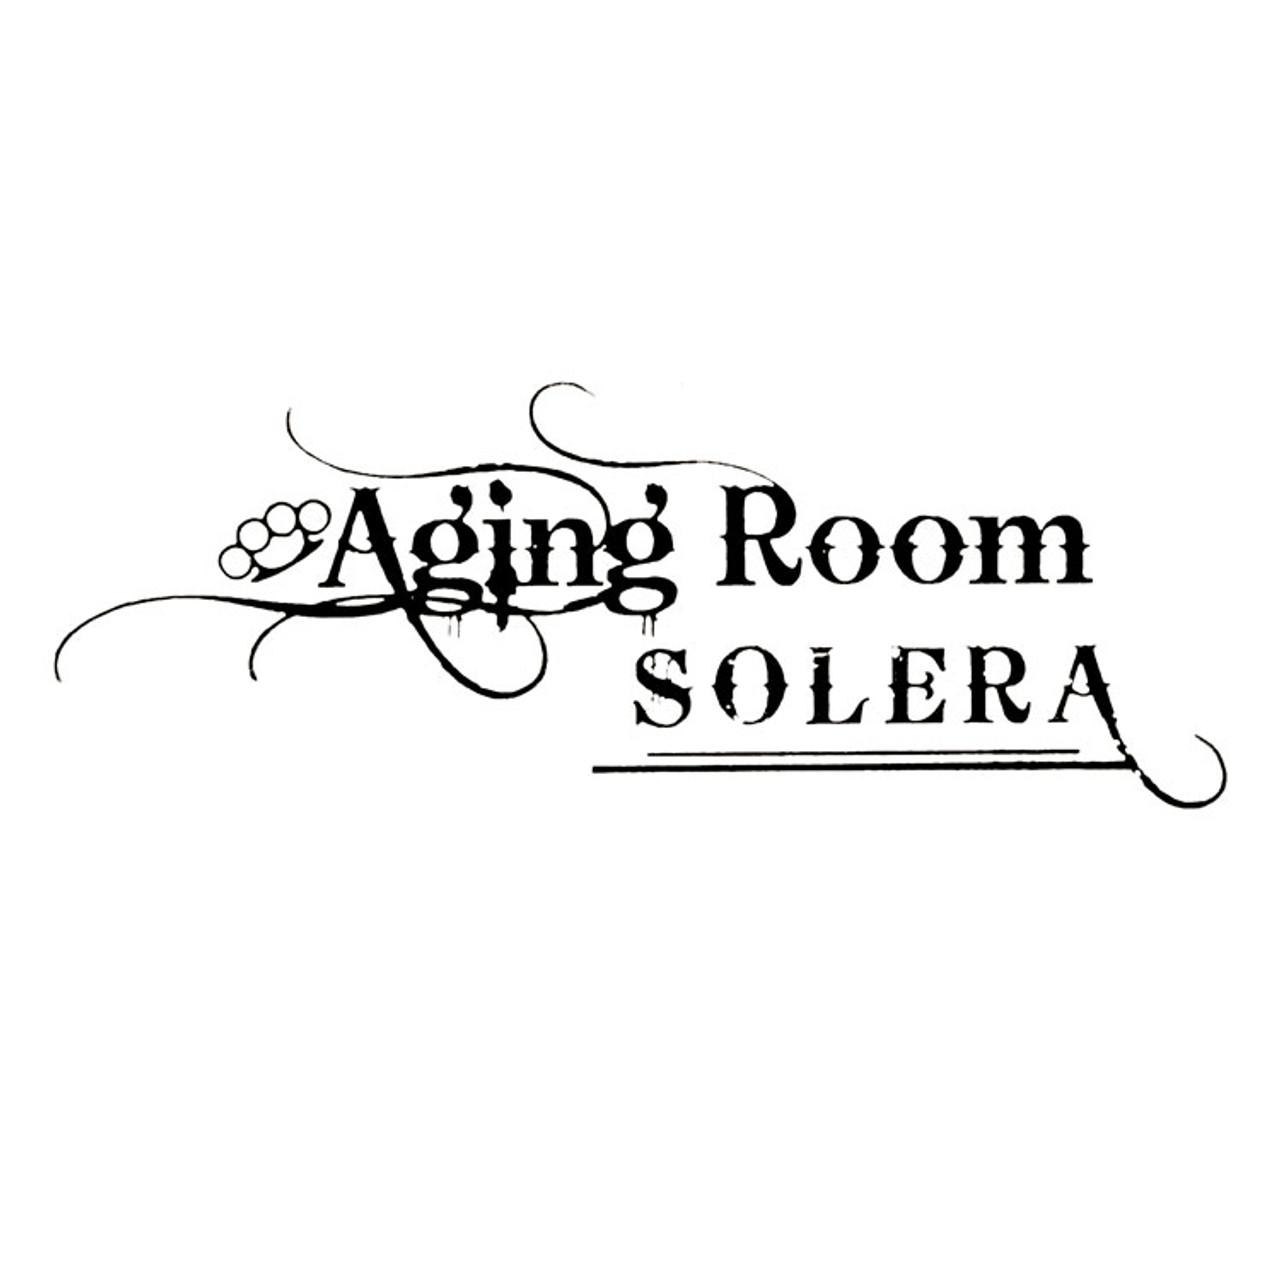 Aging Room Solera Festivo Shade Cigars - 4.75 x 52 (Box of 21)